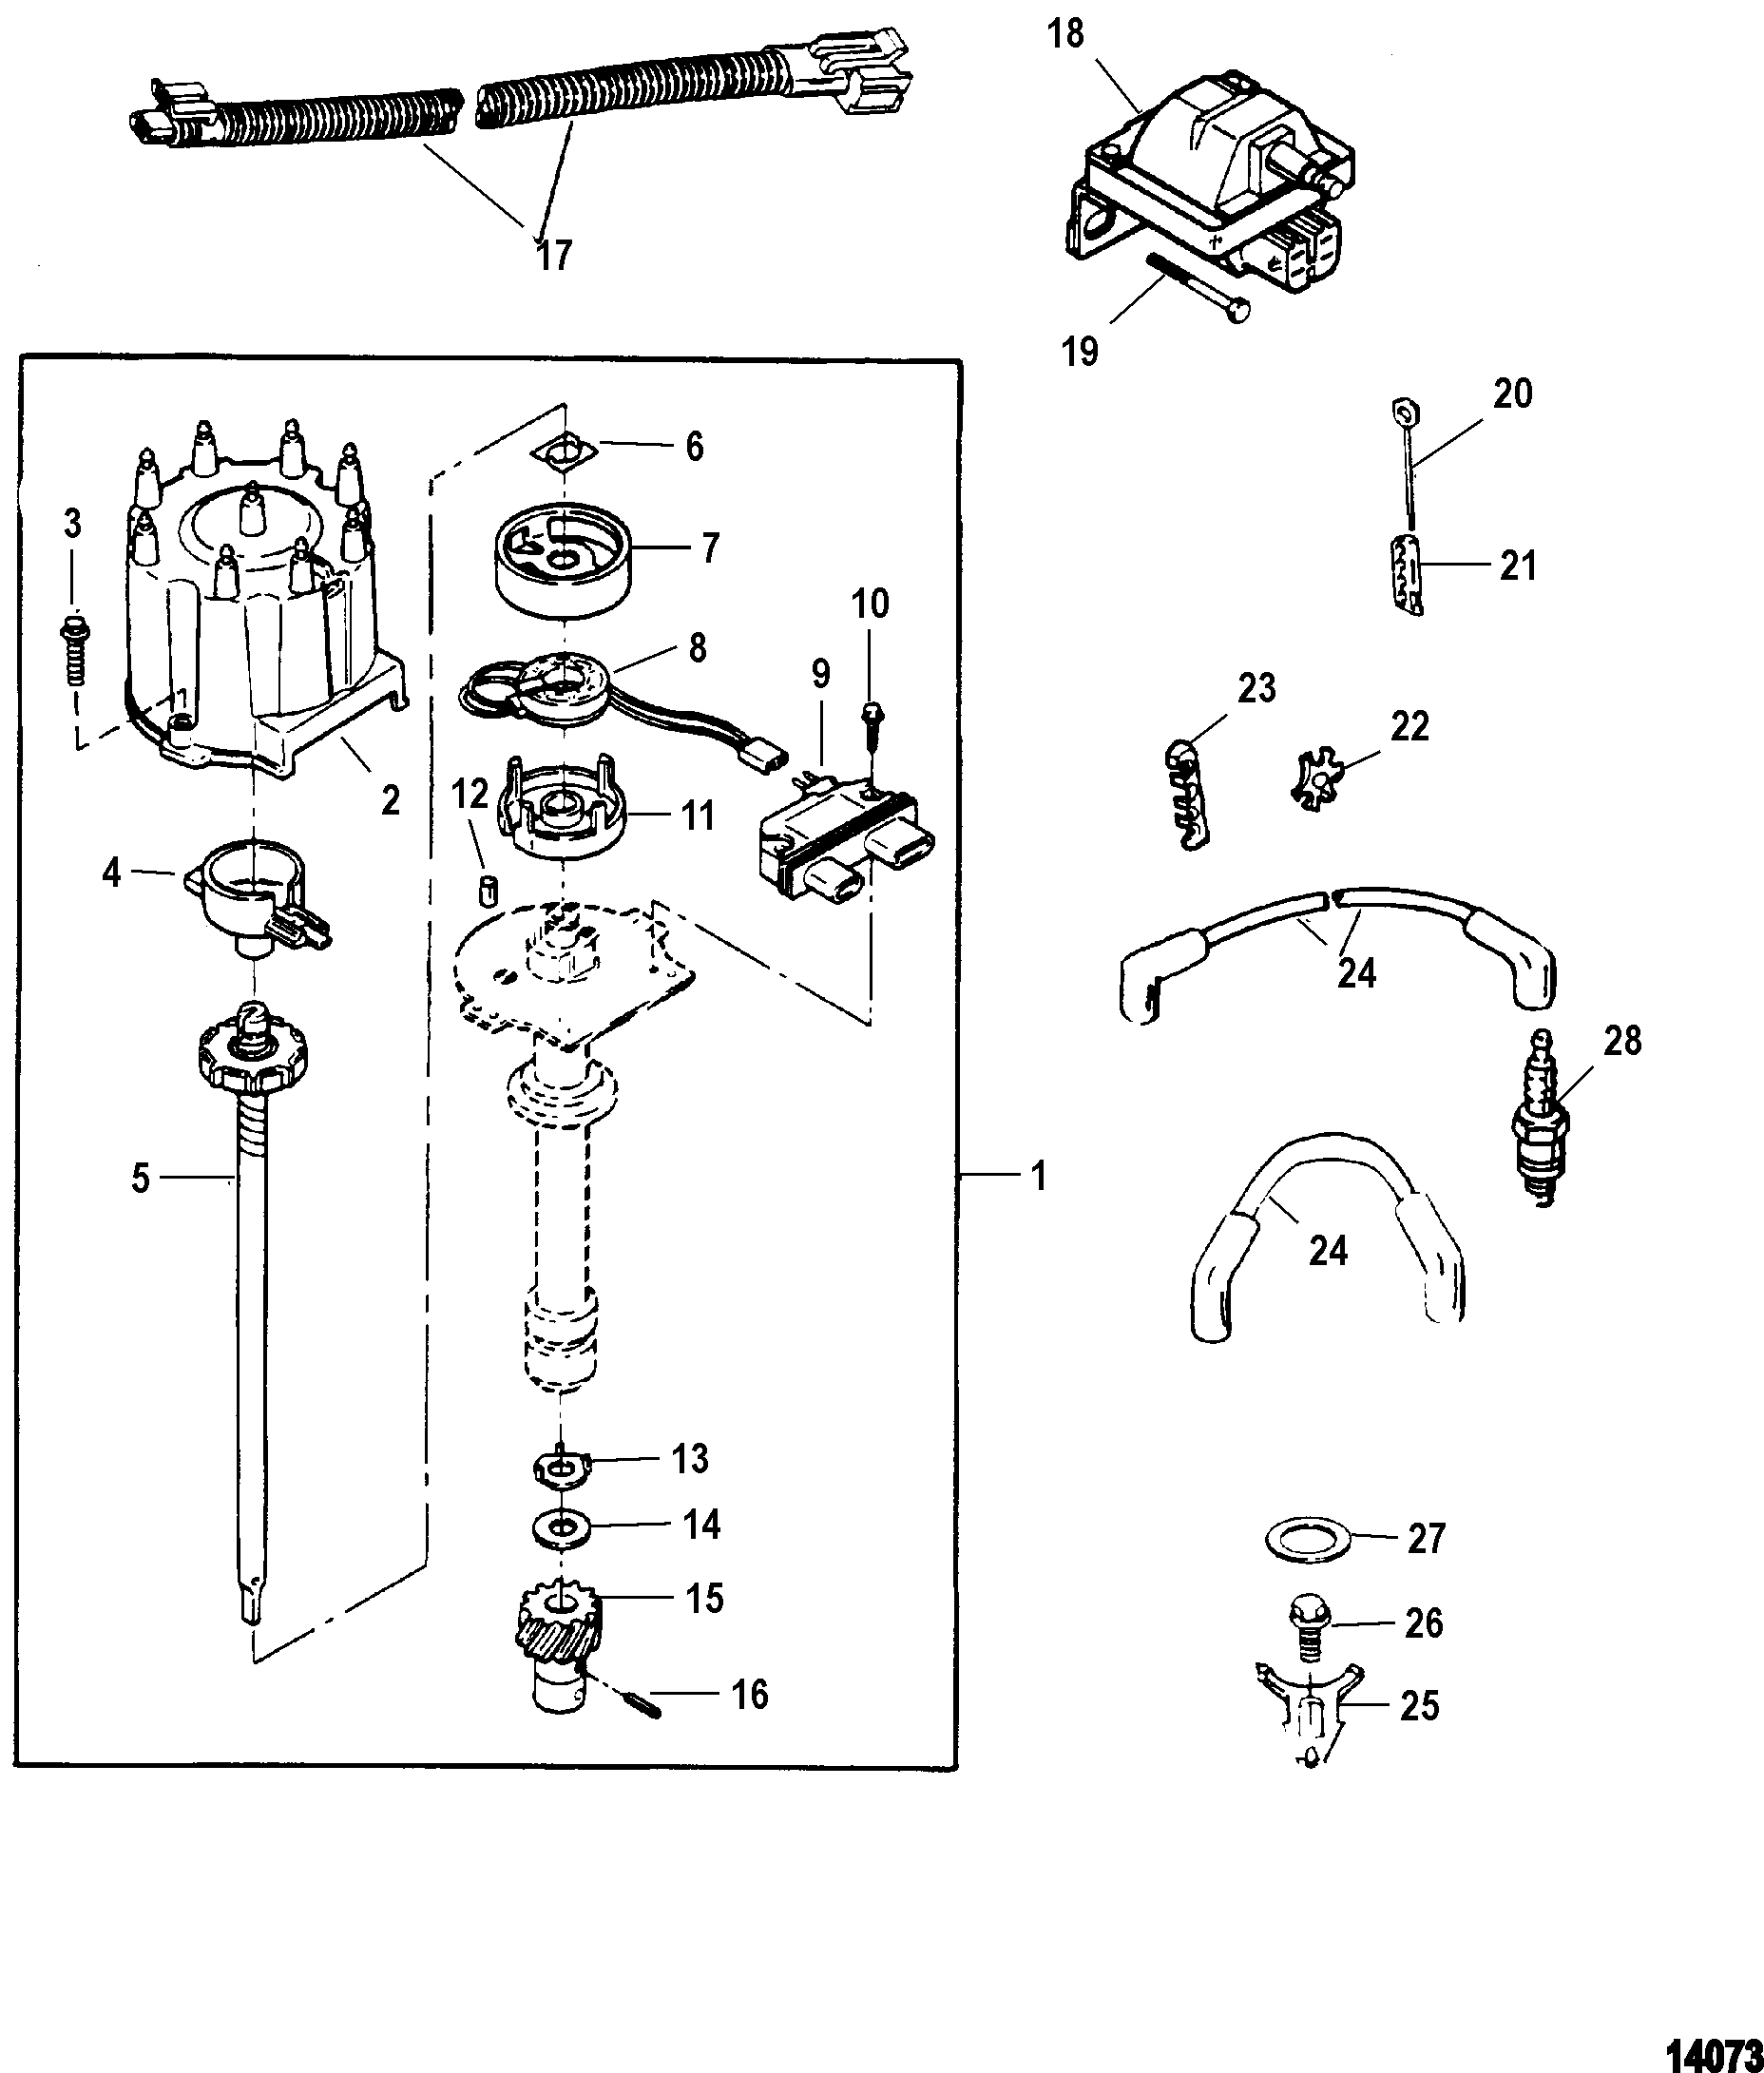 Mercruiser Ignition Coil Wiring Diagram